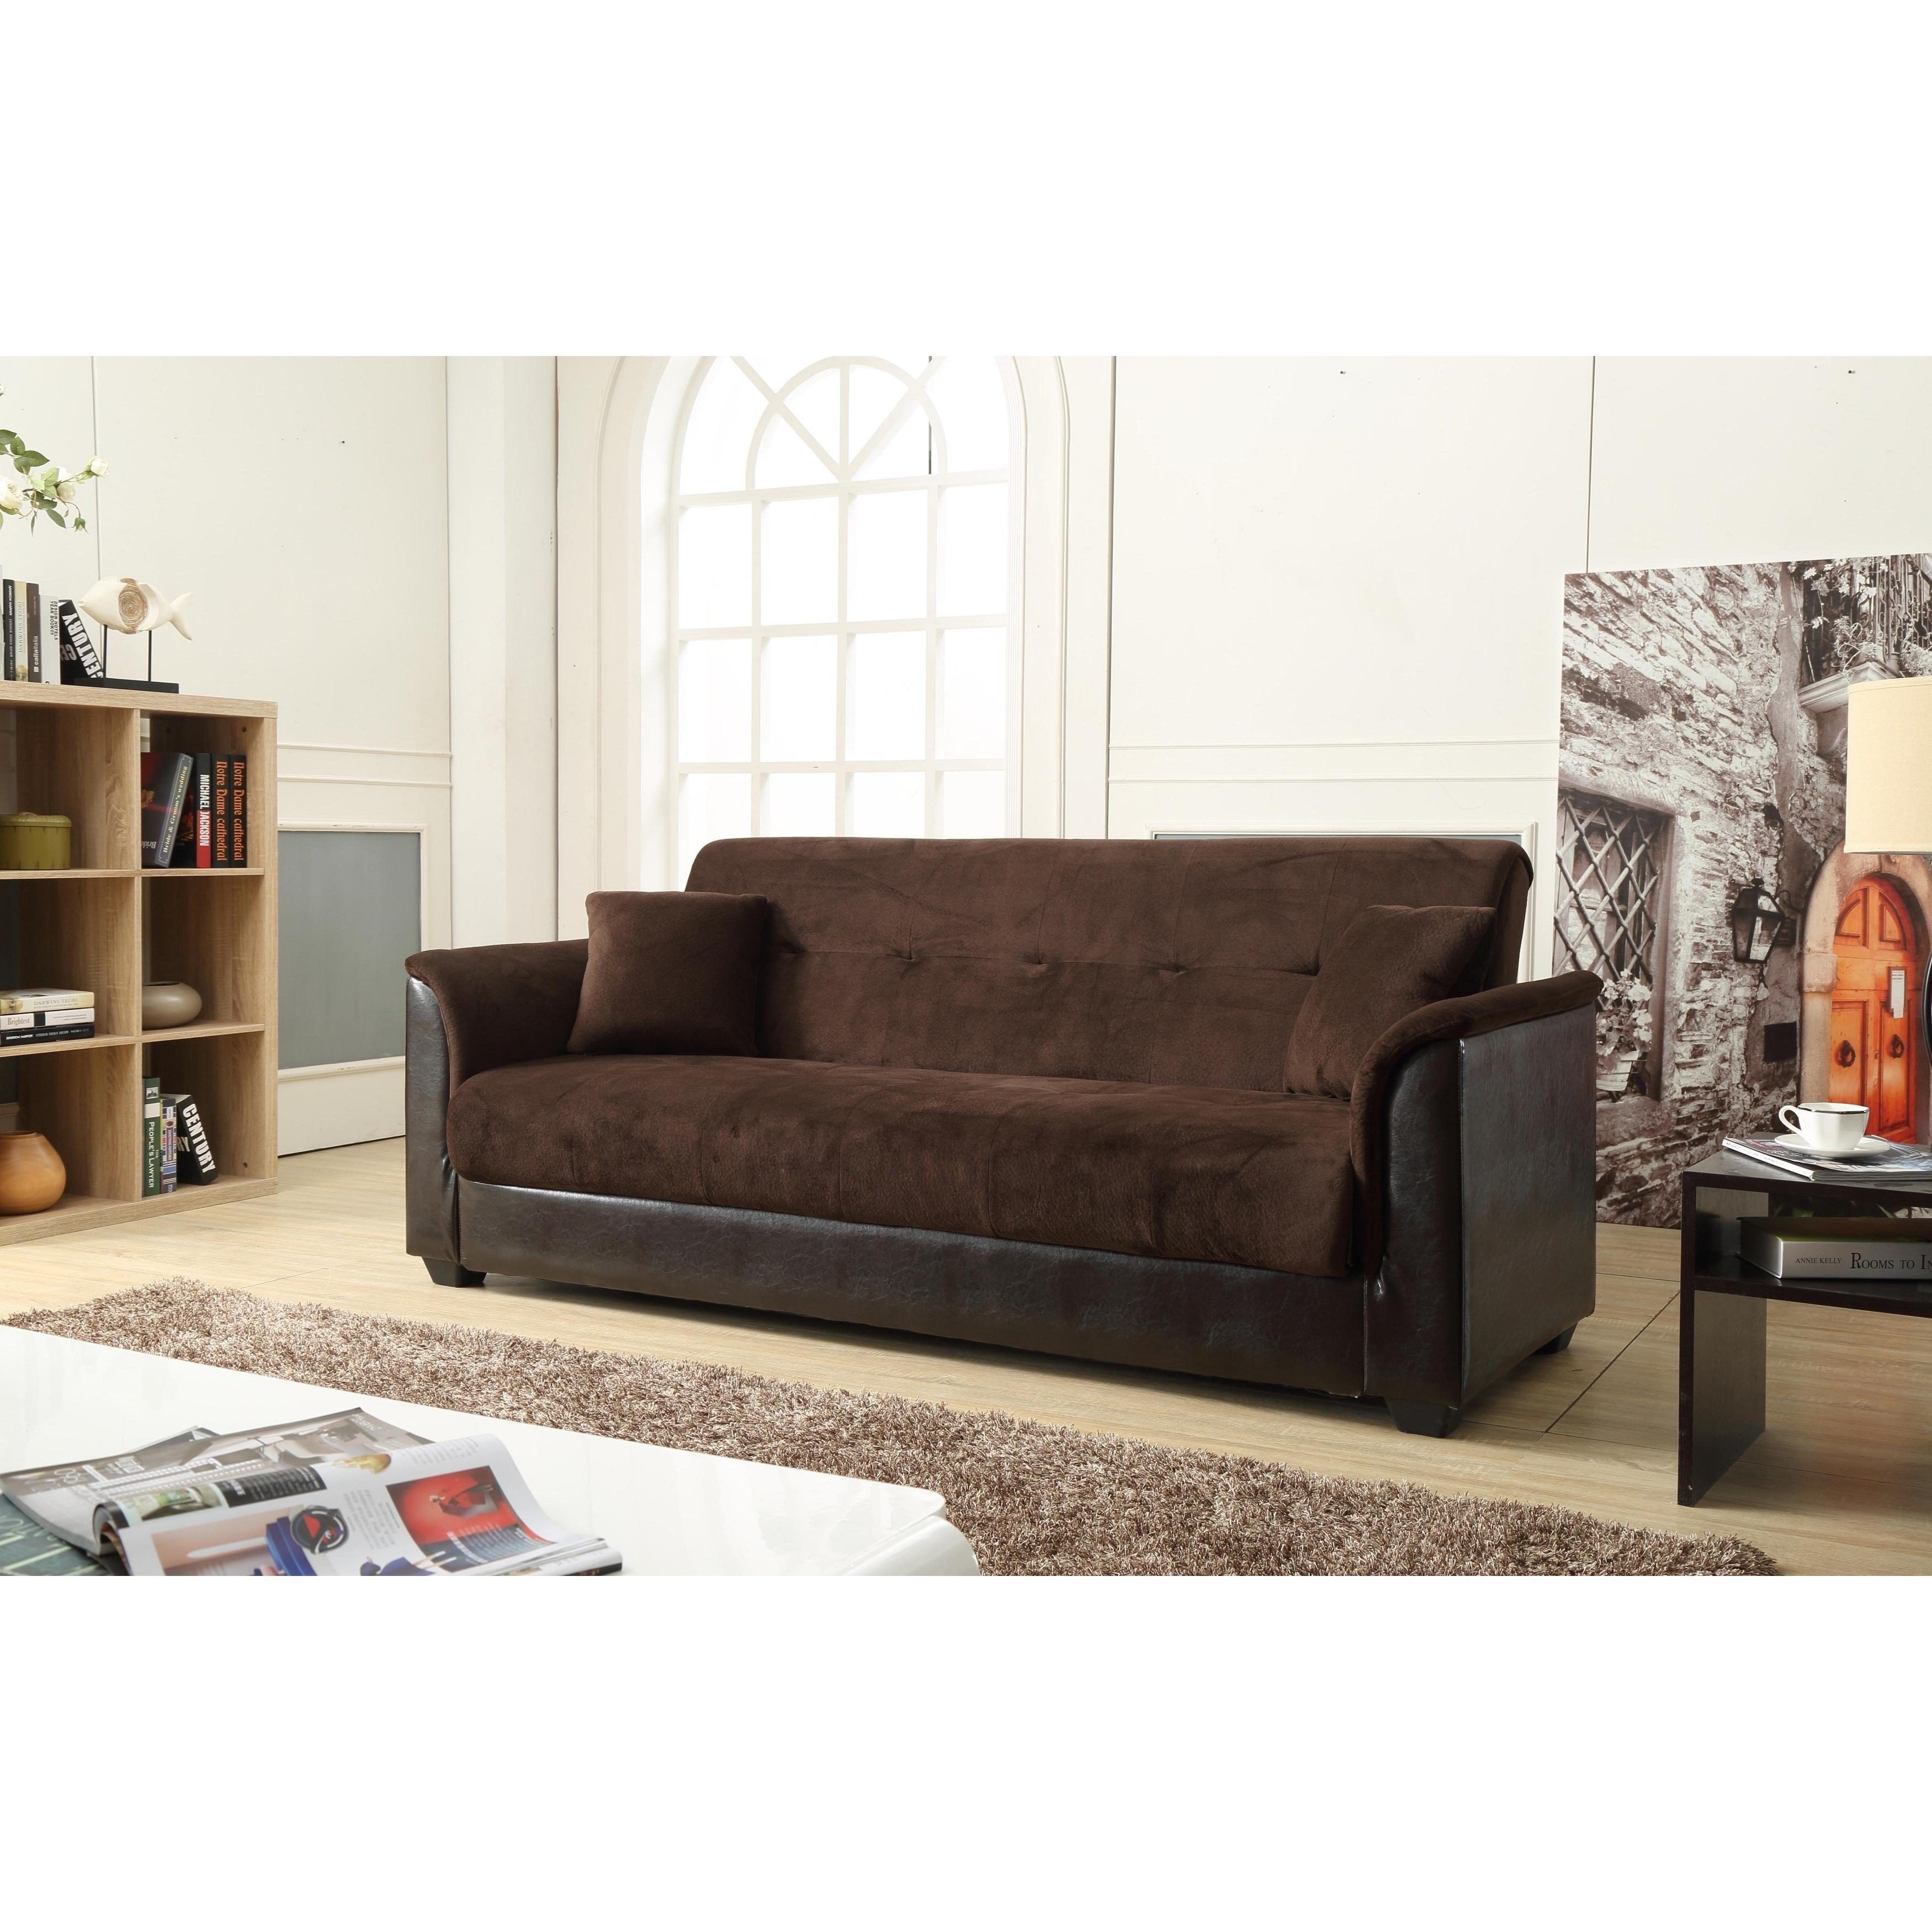 Shop Nathanial Home Melanie Brown Champion Storage Futon Sofa Bed